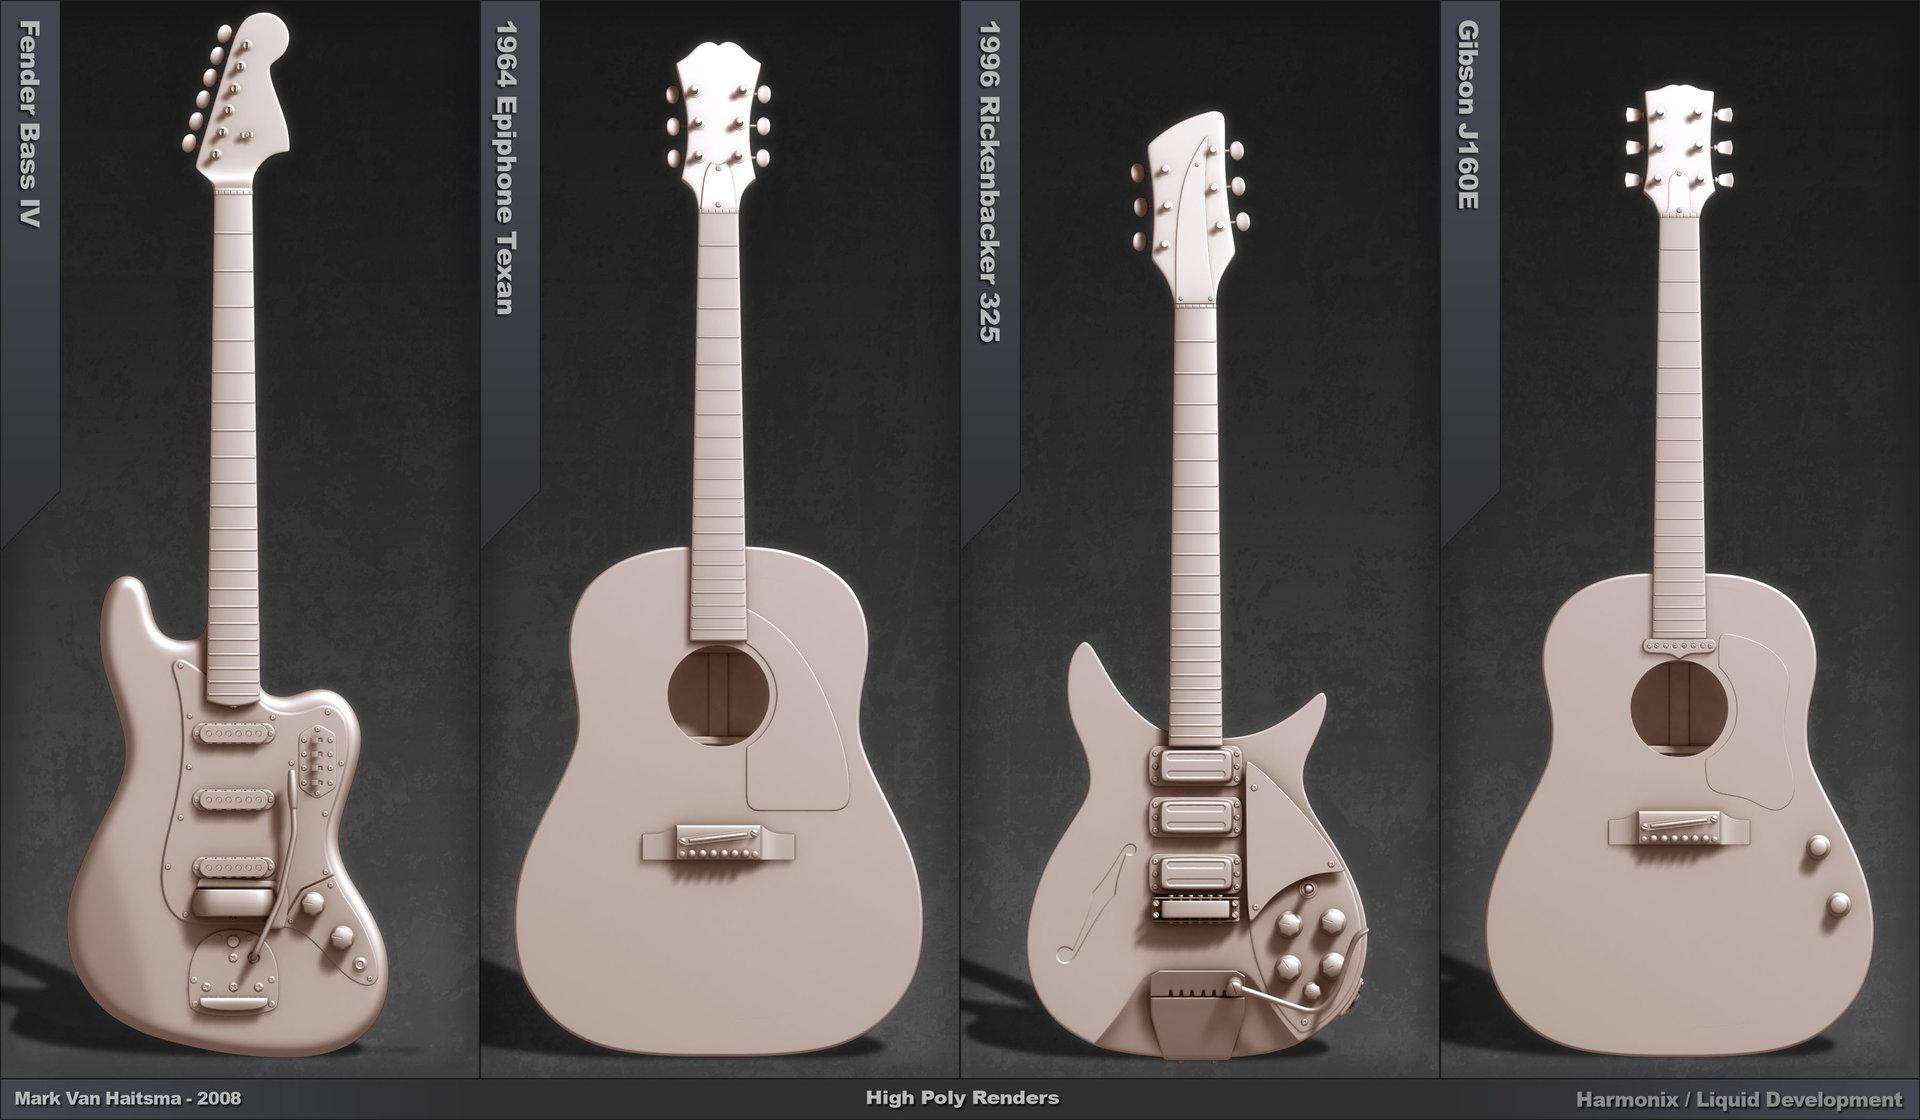 Mark van haitsma guitar portfolio page 2 models